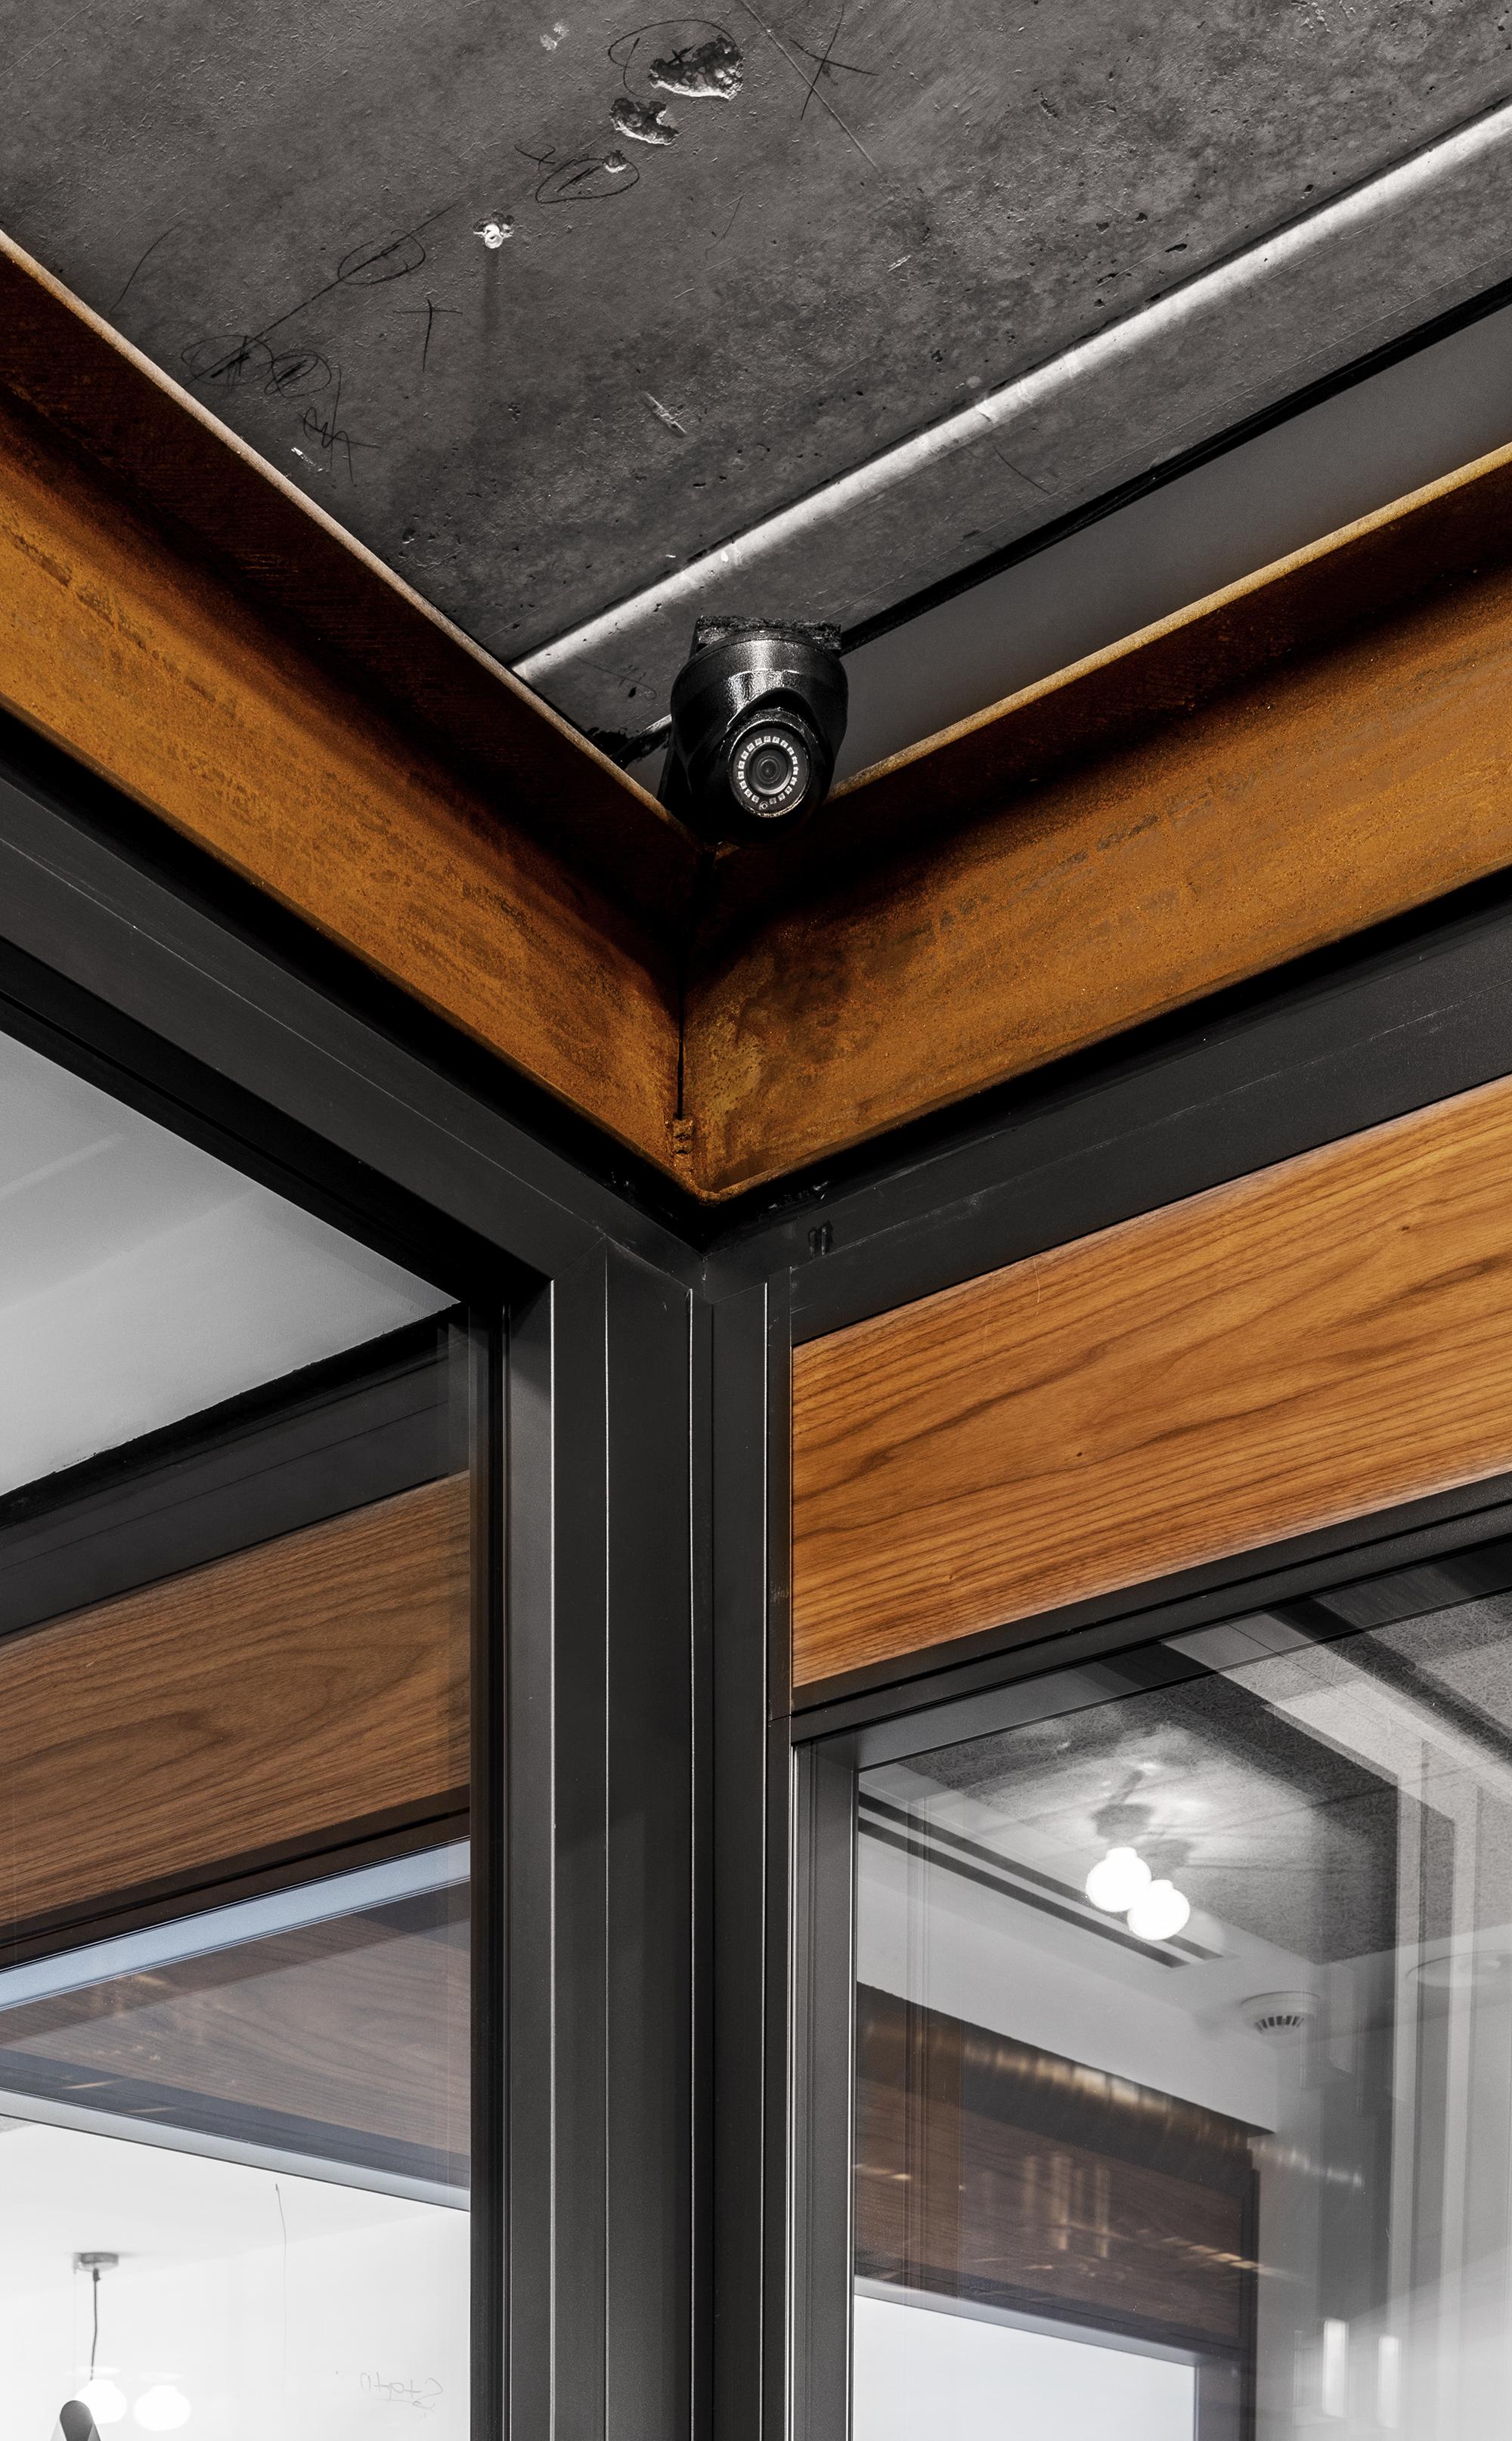 ROY DAVID ARCHITECTURE - STUDIO - ART MEDICAL OFFICES - רואי דוד אדריכלים - סטודיו רואי דוד - אדריכלות - ארט מדיקל (46).jpg